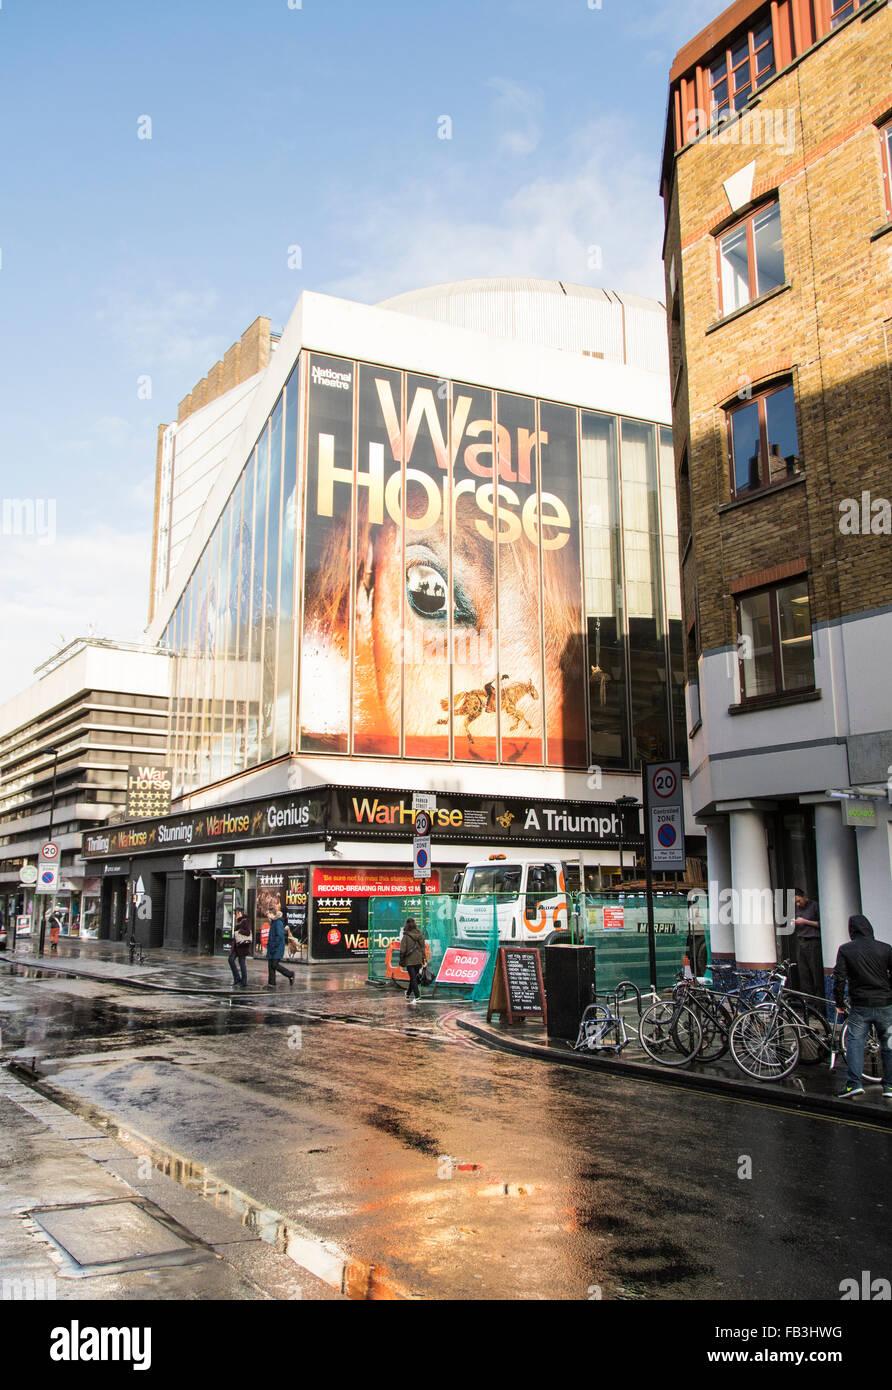 War Horse im New London Theatre Drury Lane, London, Großbritannien Stockbild